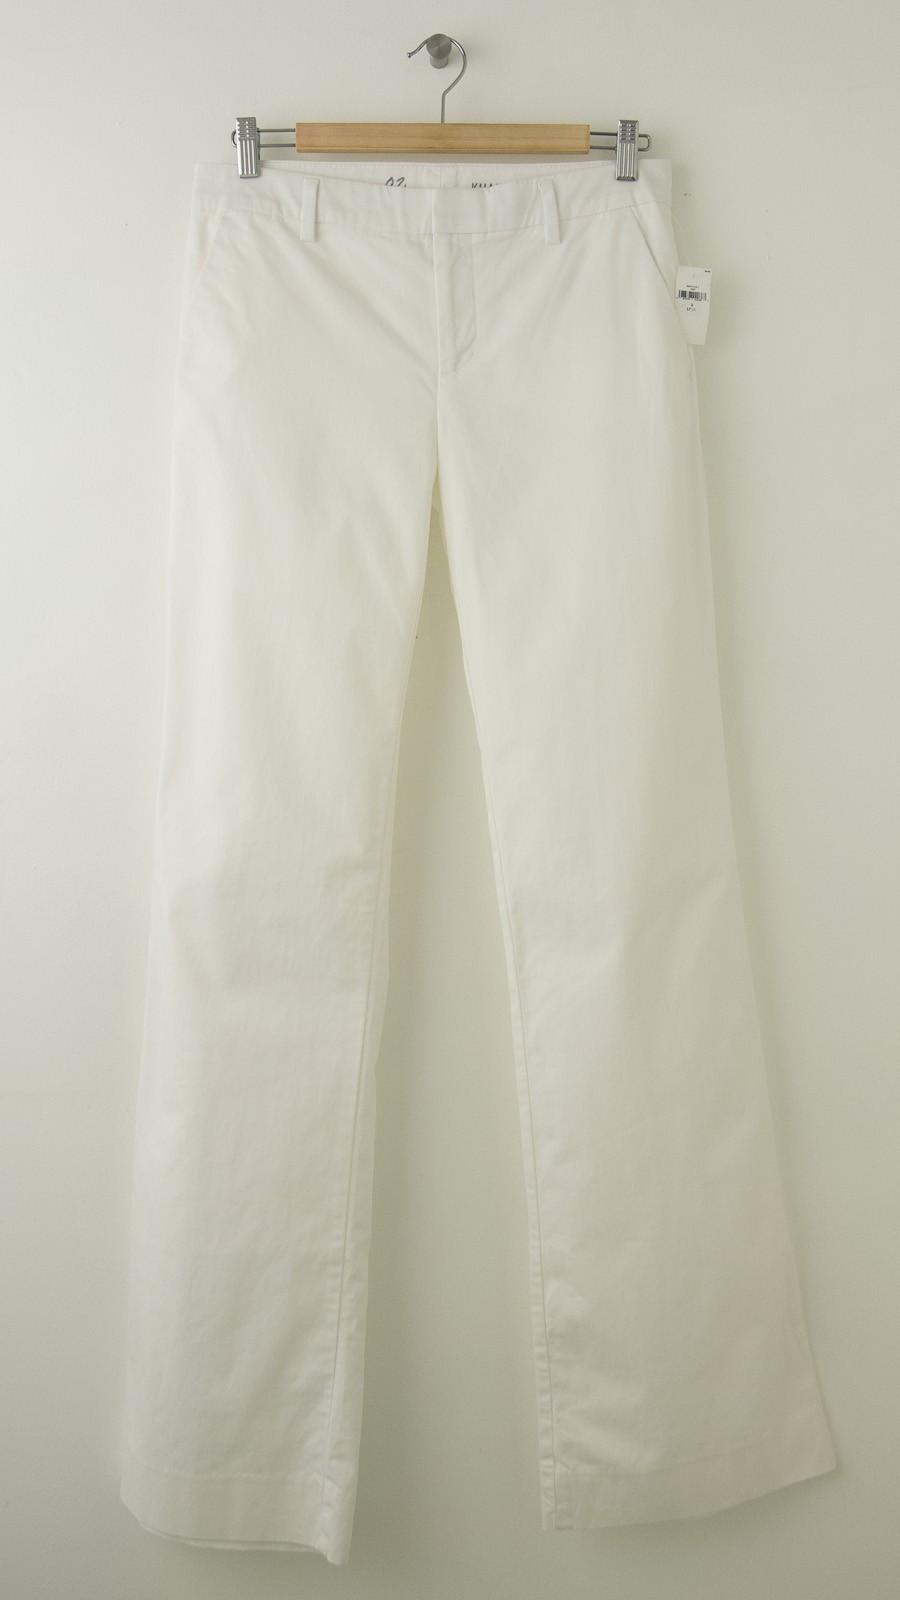 Elegant White Pants  White Pants 2016  Part 557